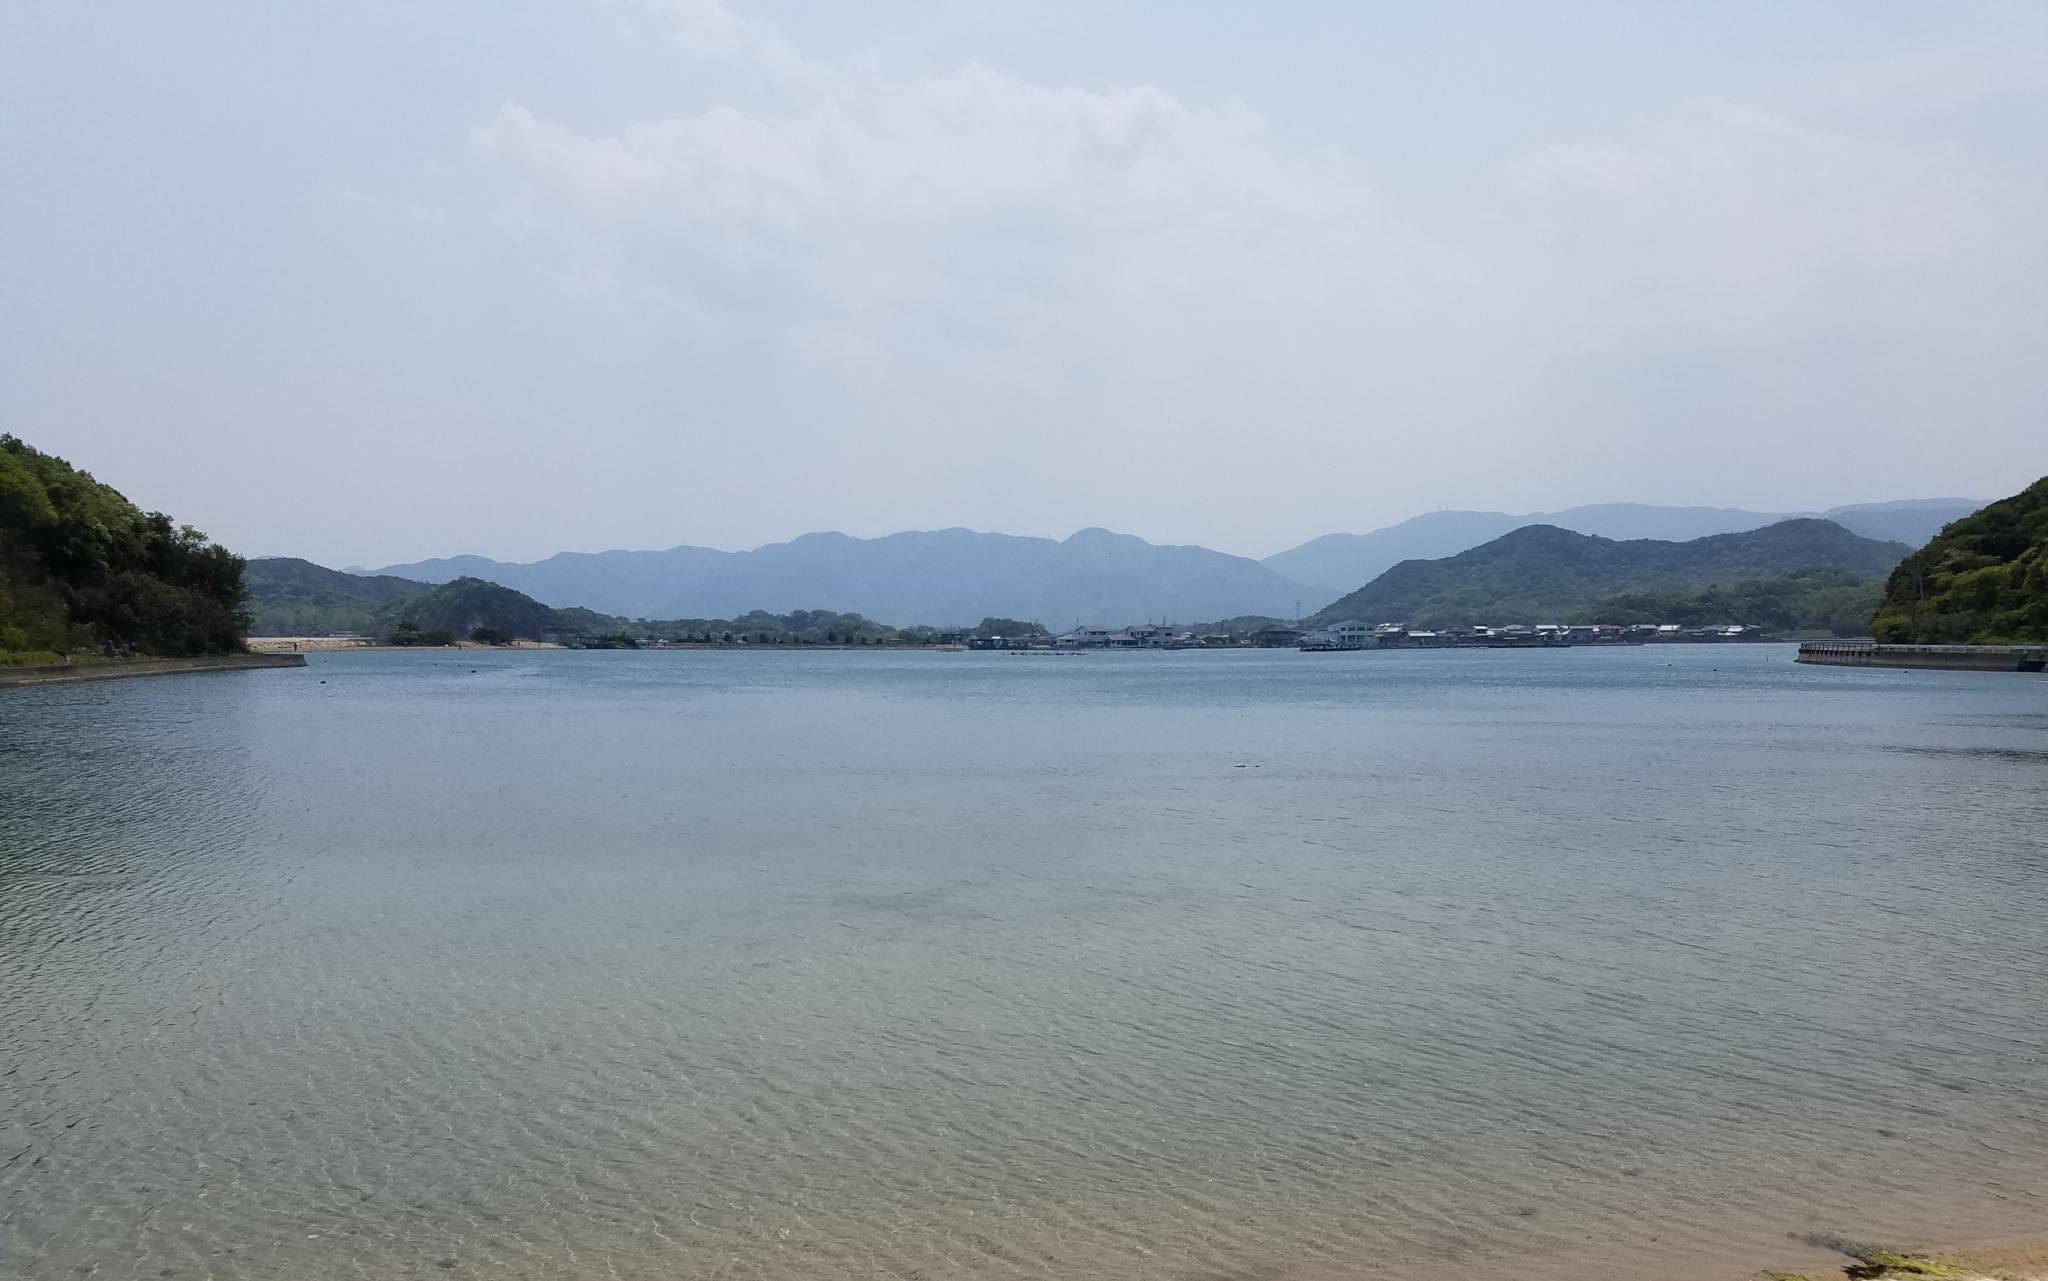 f:id:ToshUeno:20170429114808j:plain